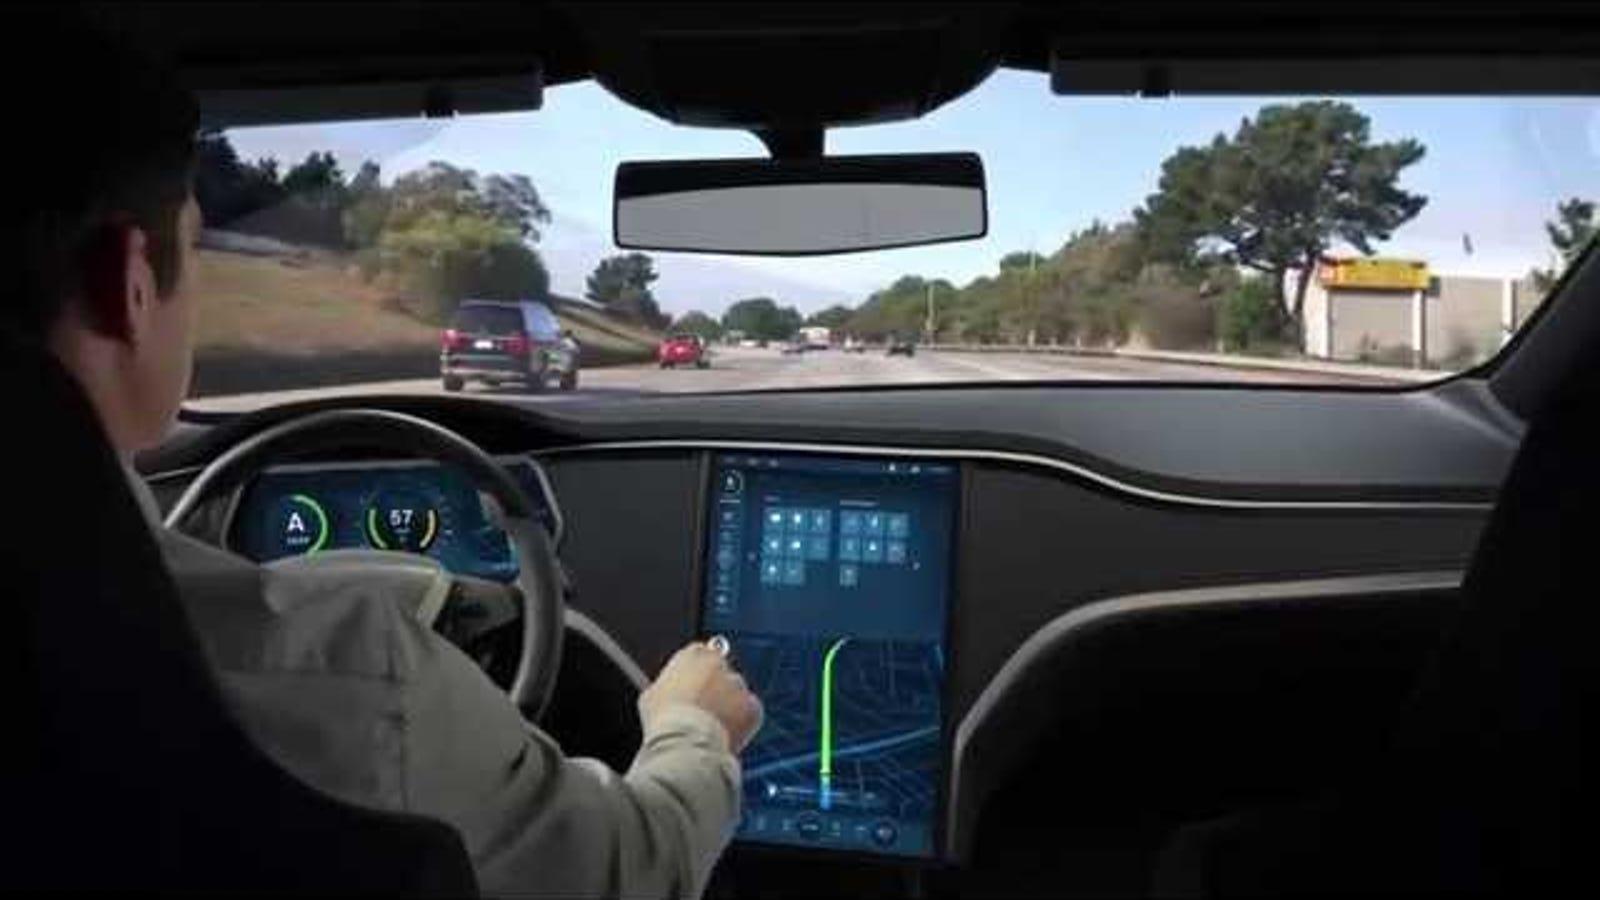 I'd Rather Have a Half-Driverless Car